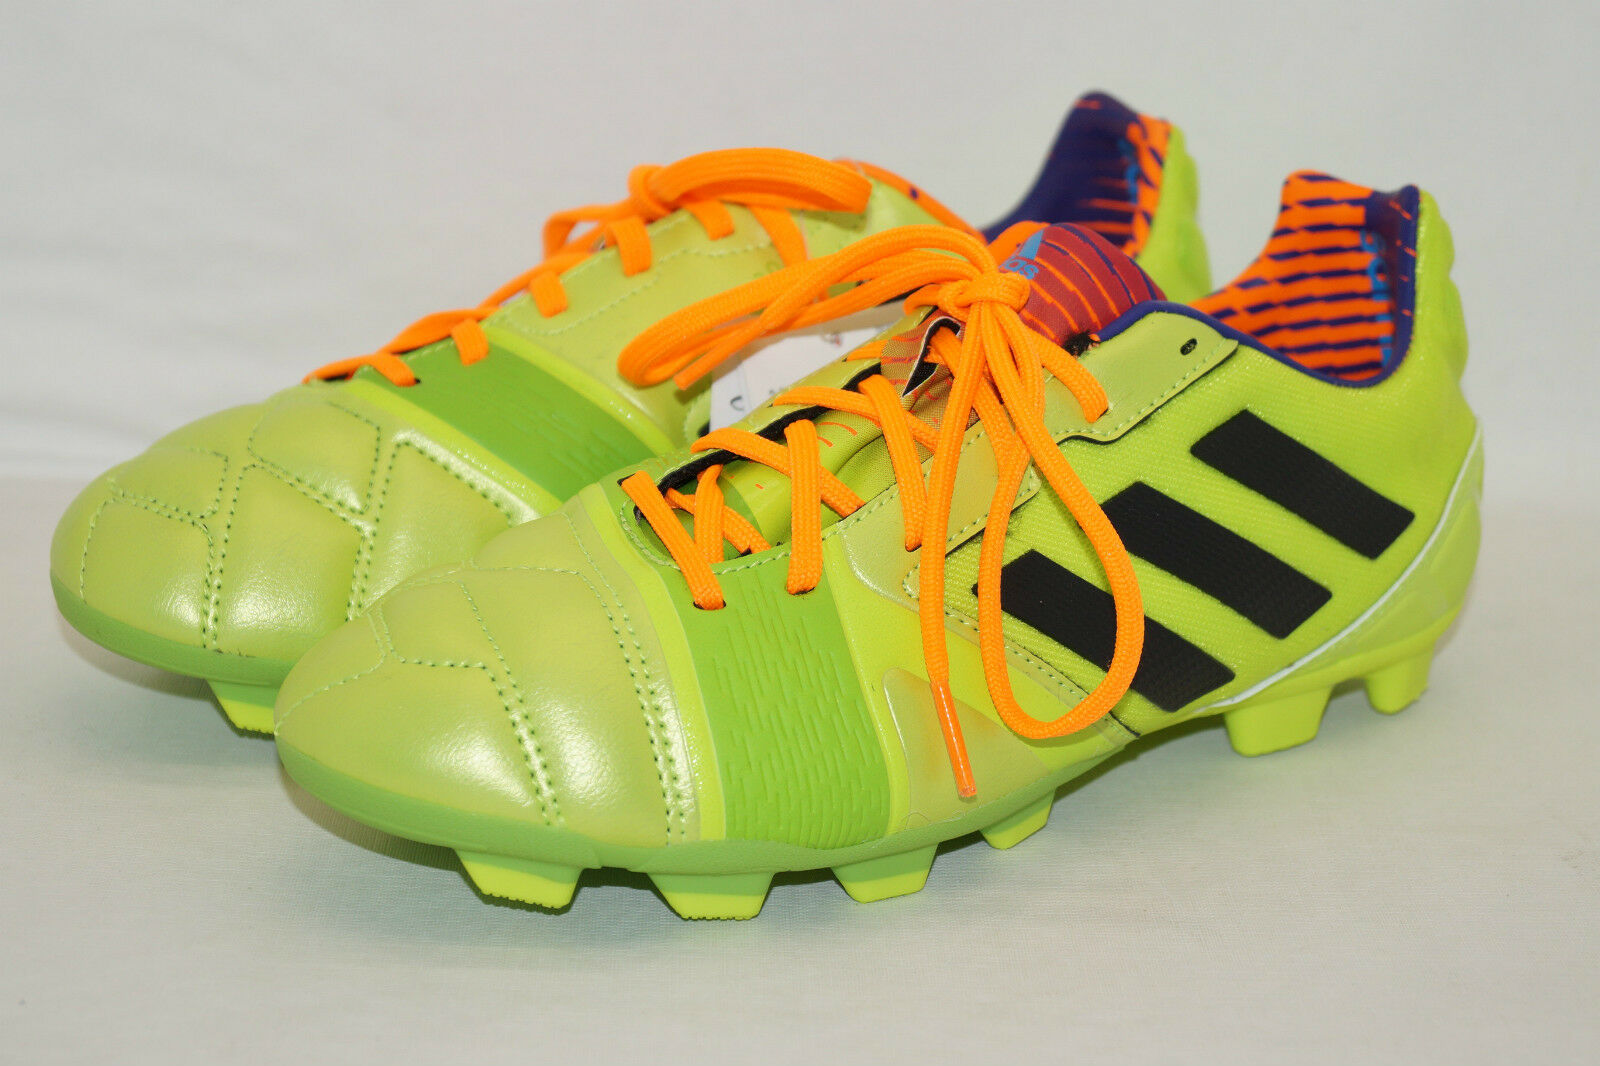 Adidas nitrocharge 2.0 TRX FG J green Gr.38 2 3UK.5,5 Fussballschuhe Neu